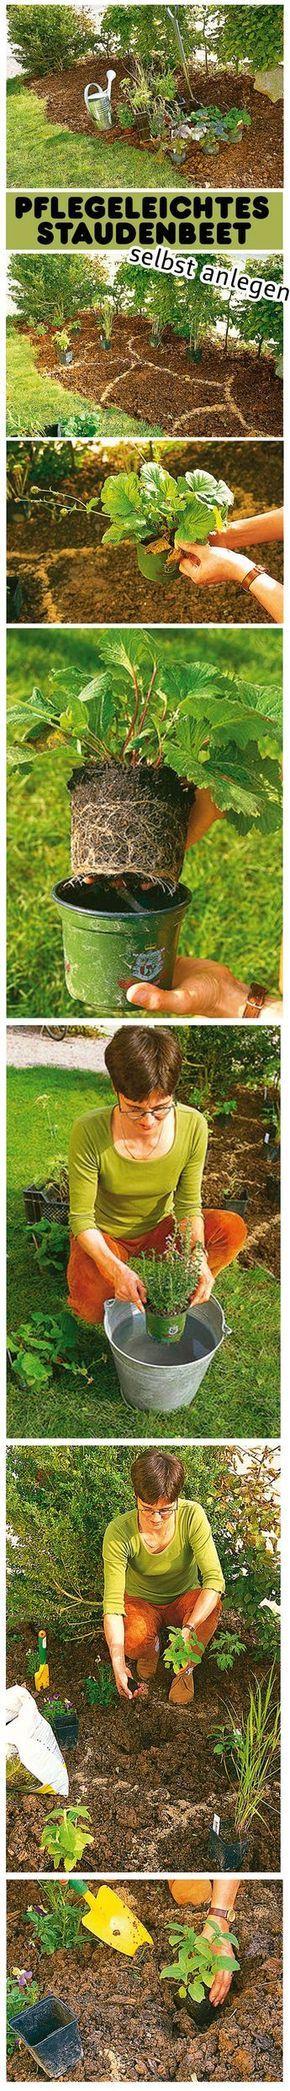 Die besten 25+ Blumengarten Ideen auf Pinterest Blumen anbauen - gemusegarten anlegen fur anfanger